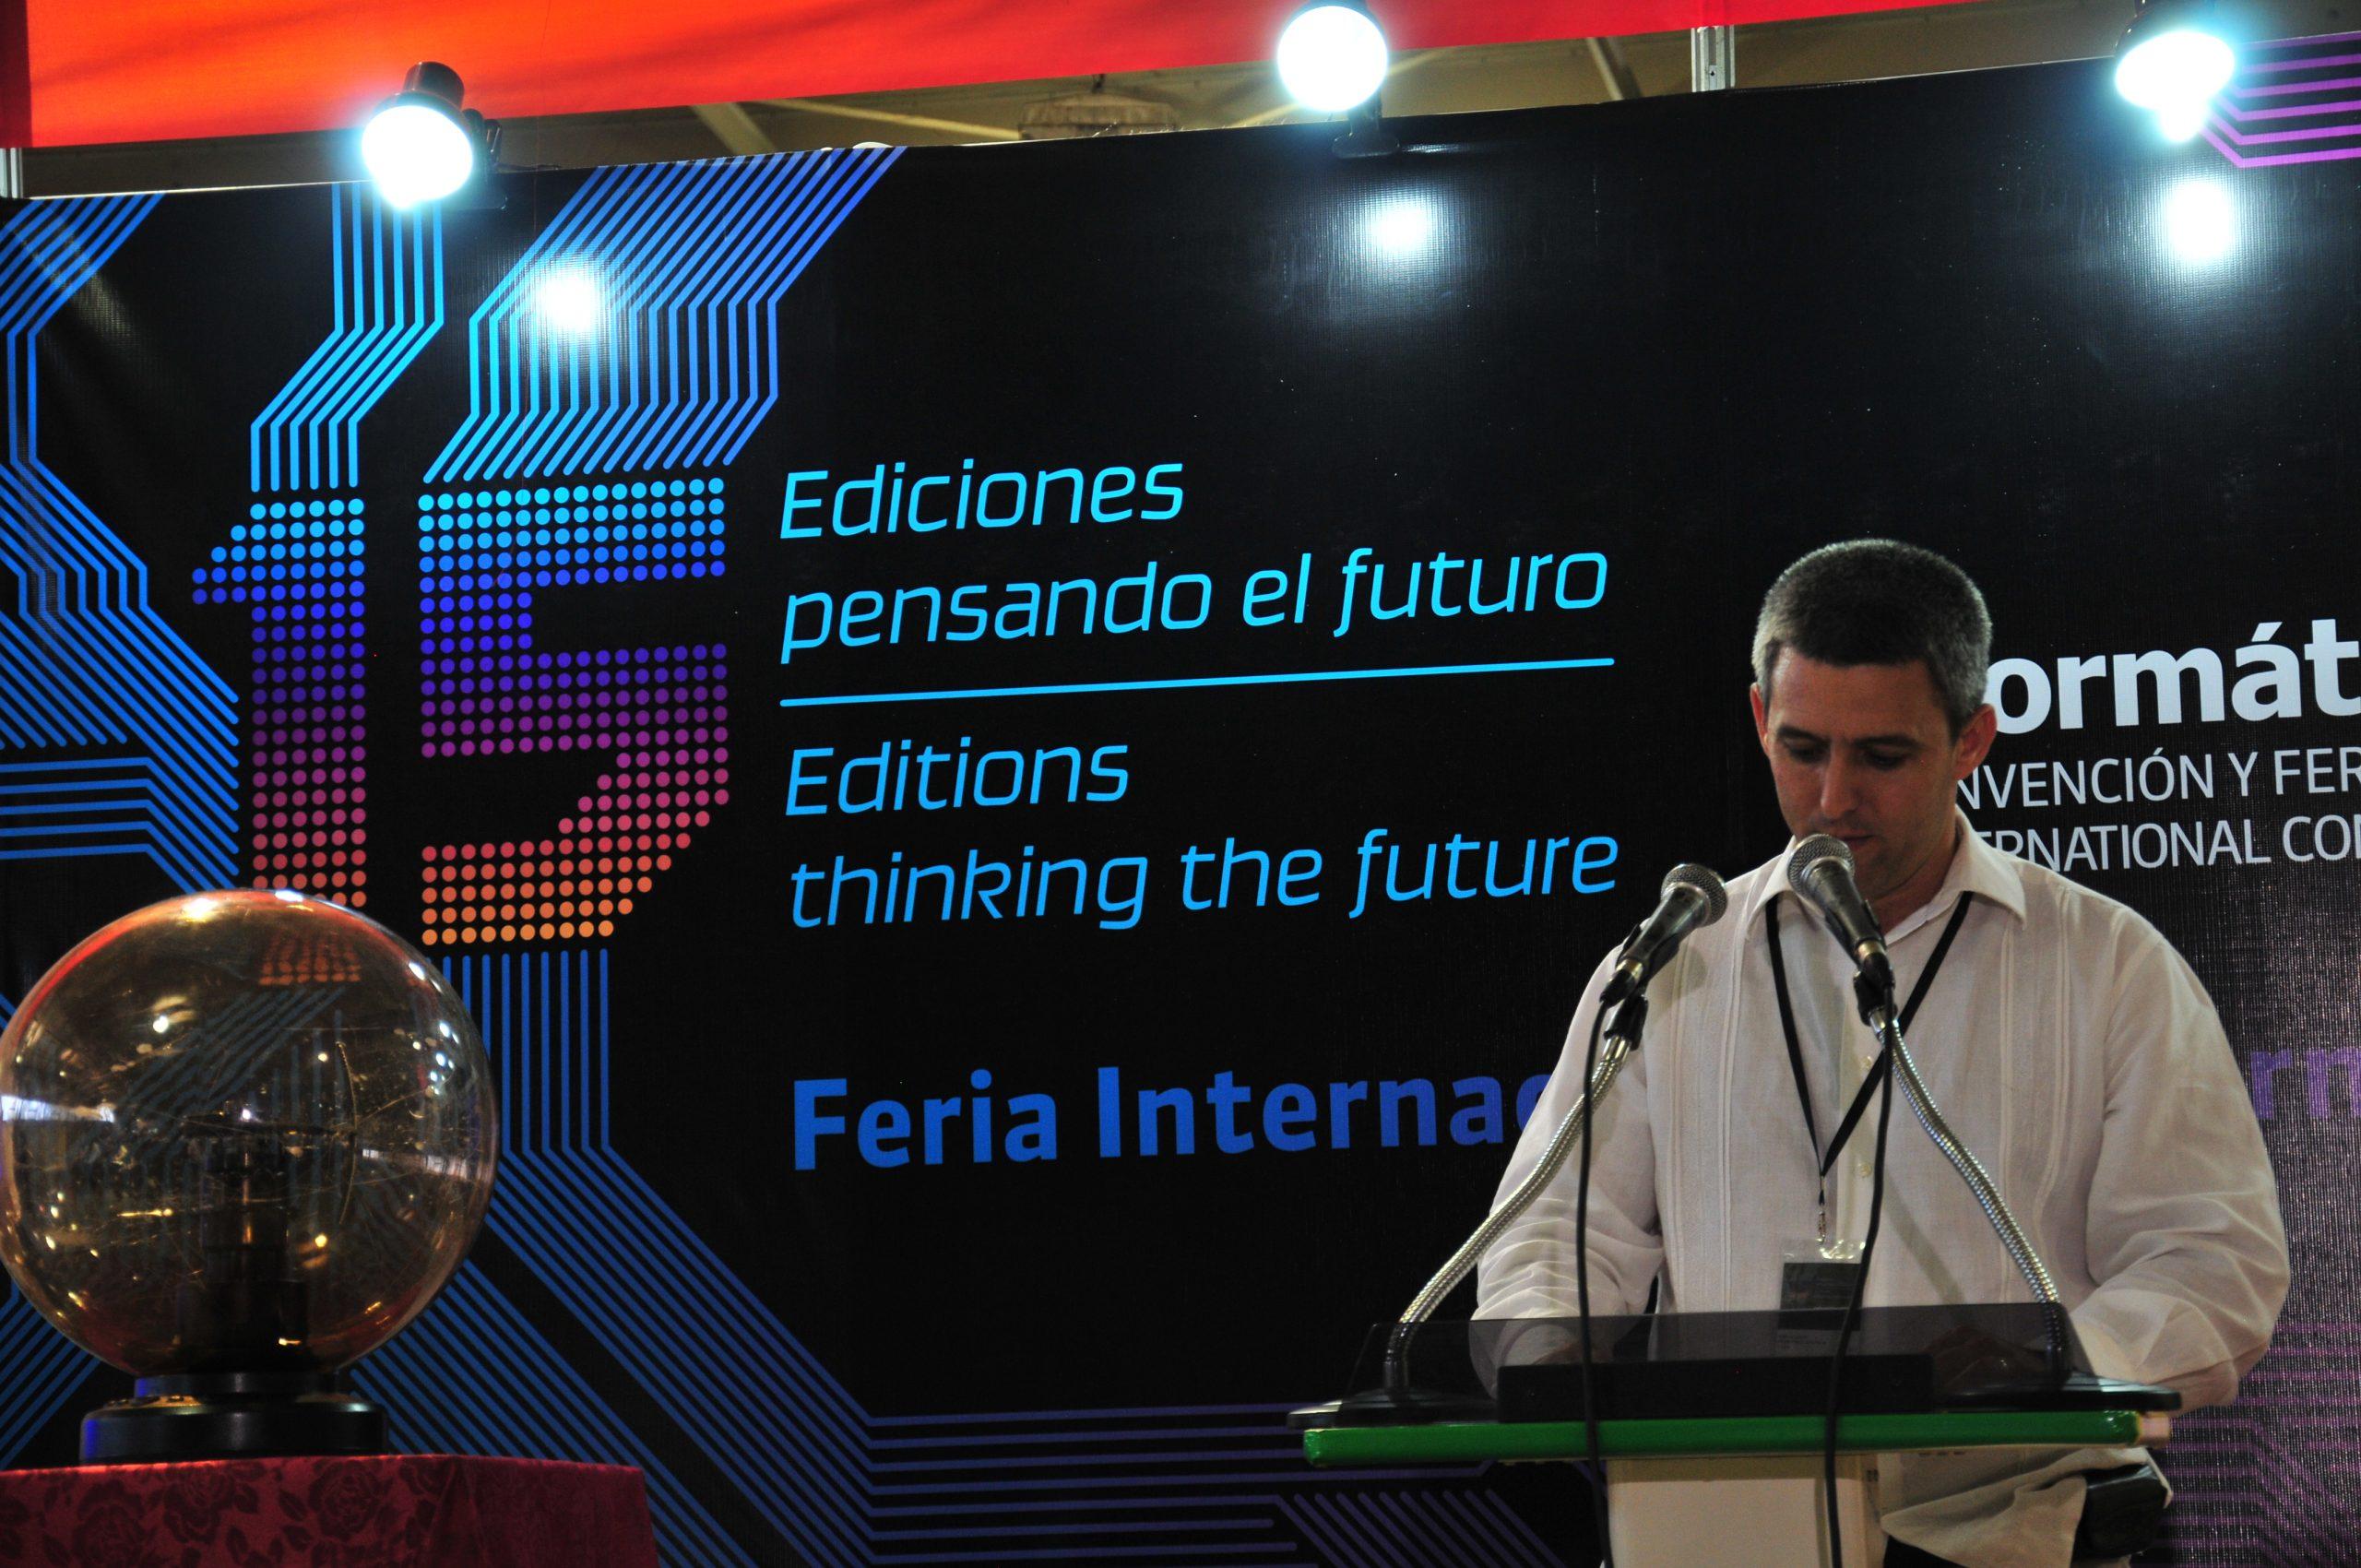 2013 Current Vice Prime Minister of Cuba, Jorge Luis Perdomo Di-Lella, then Vice Minister of Mincom inaugurating the Fair